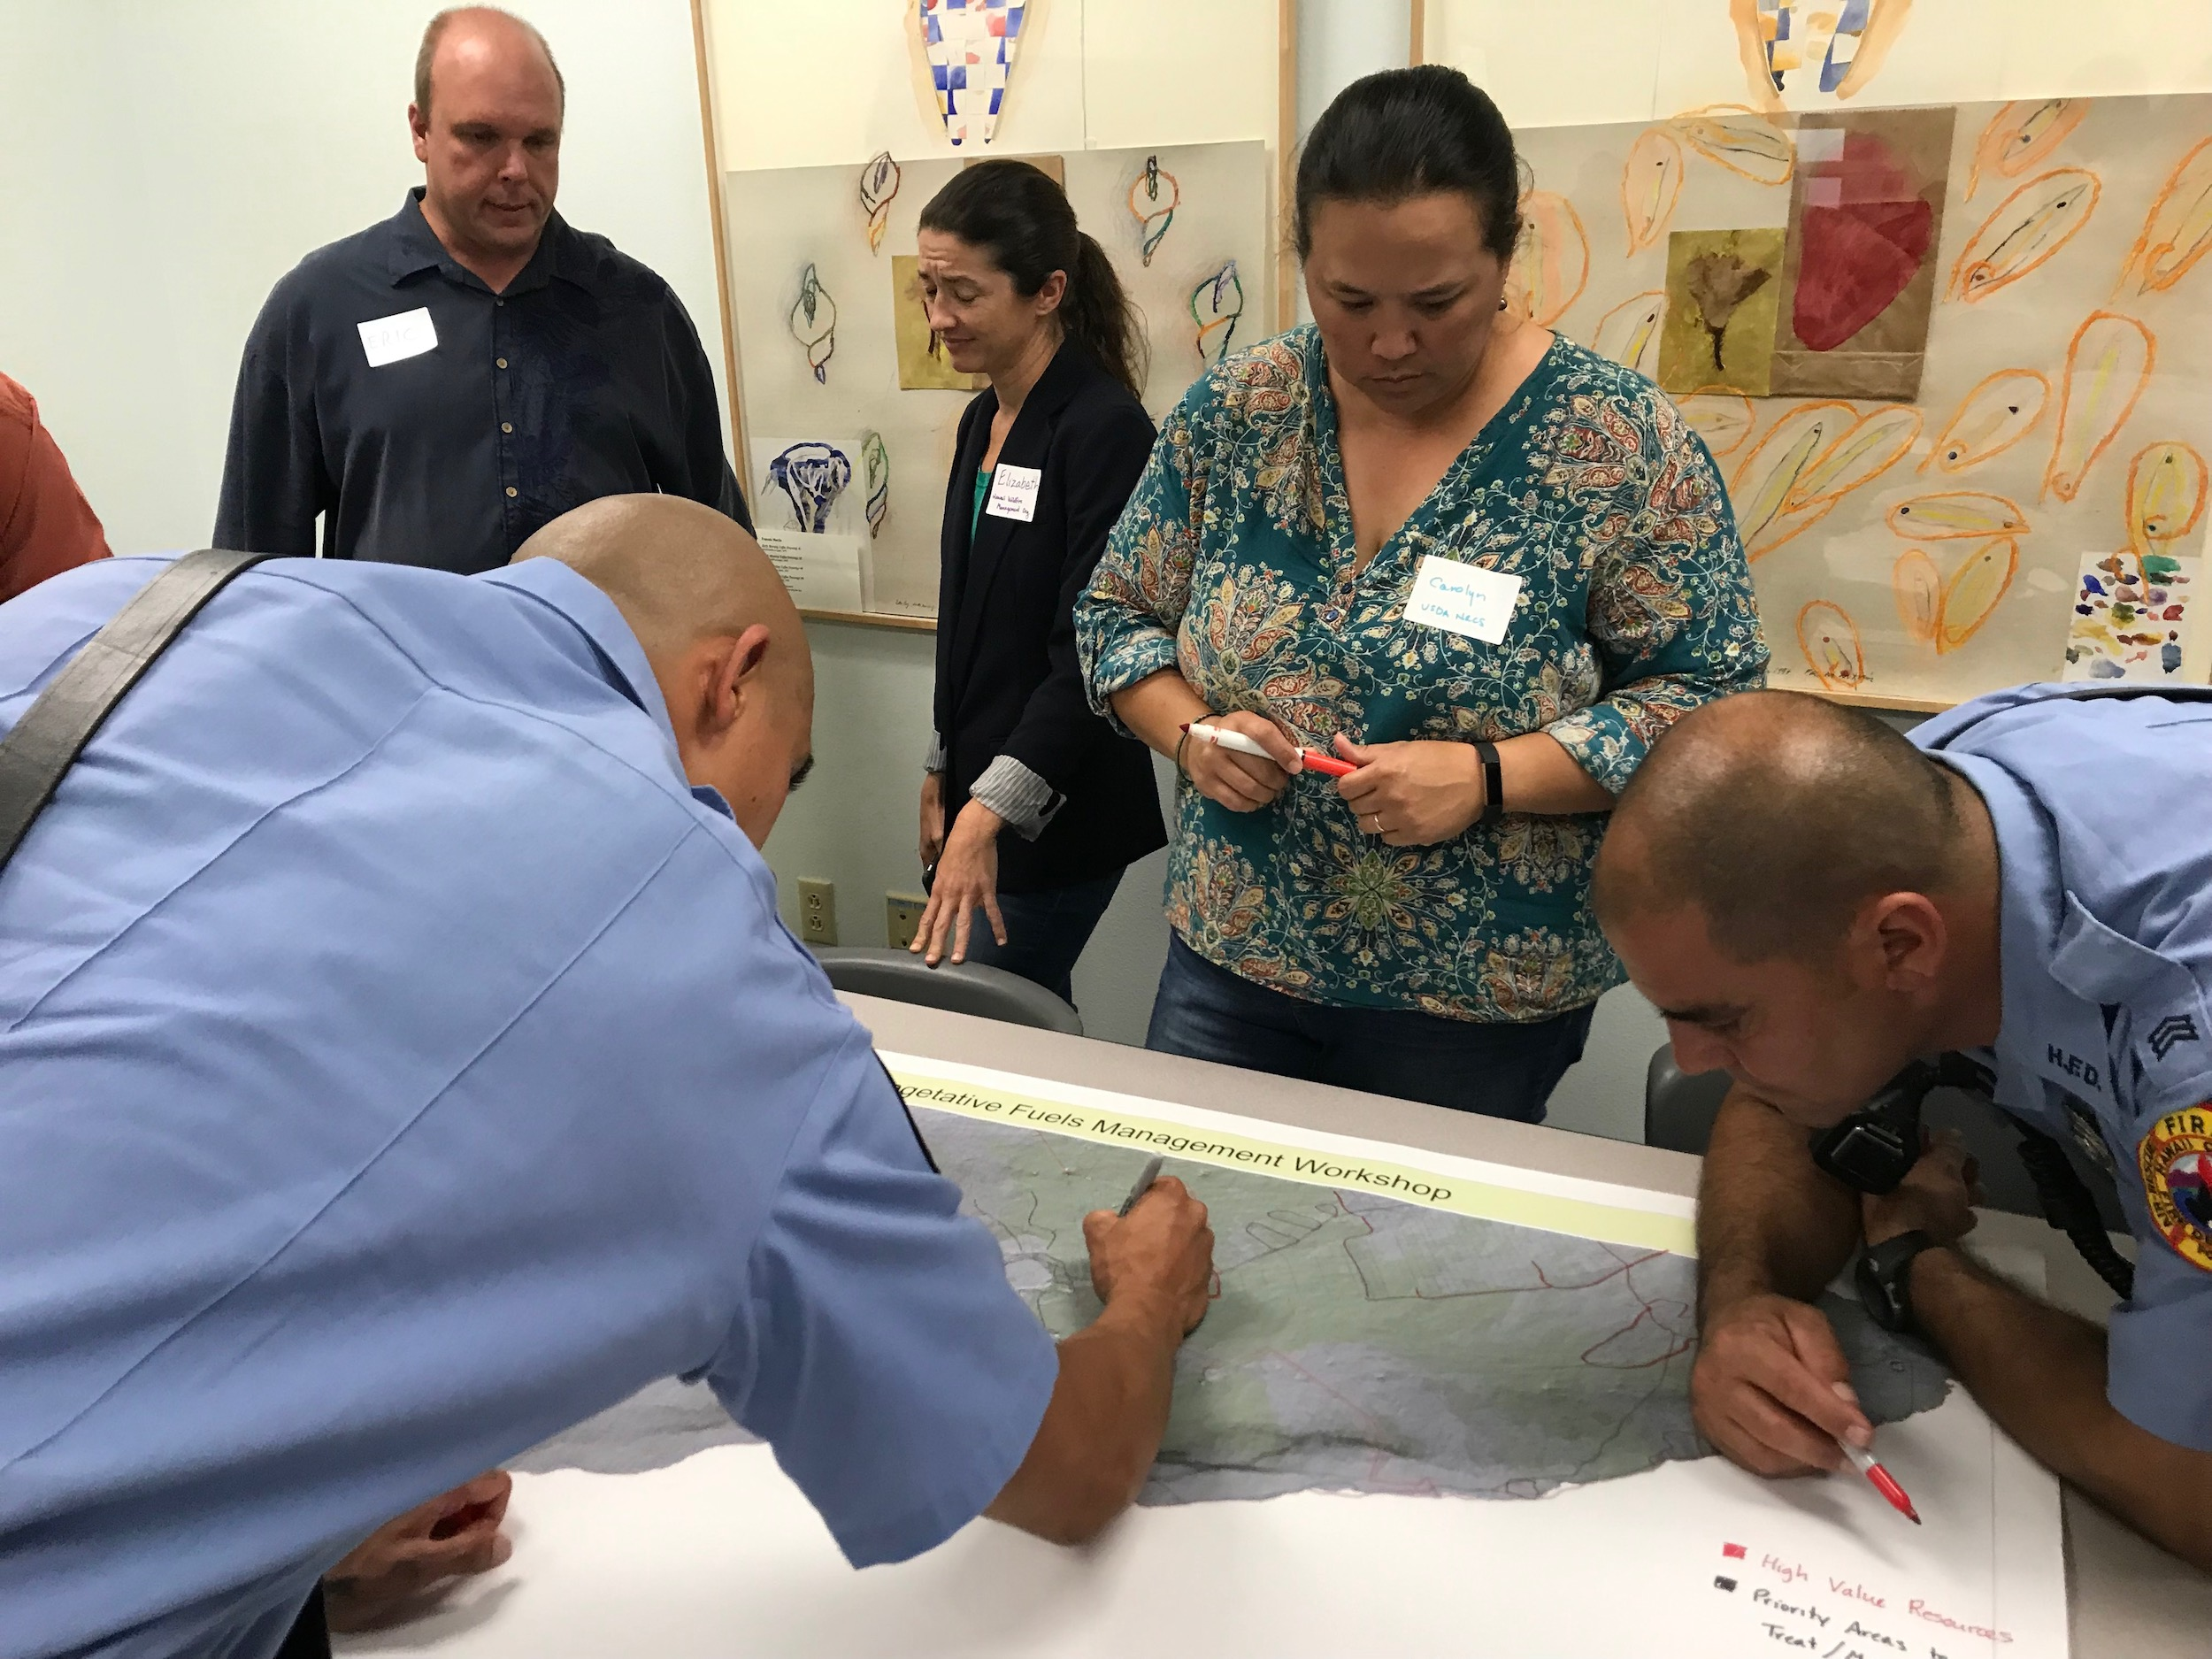 Hawaii Island Hilo Vegetative Fuels Management Collaborative Action Planning Workshop_2_22_2019_5.jpg